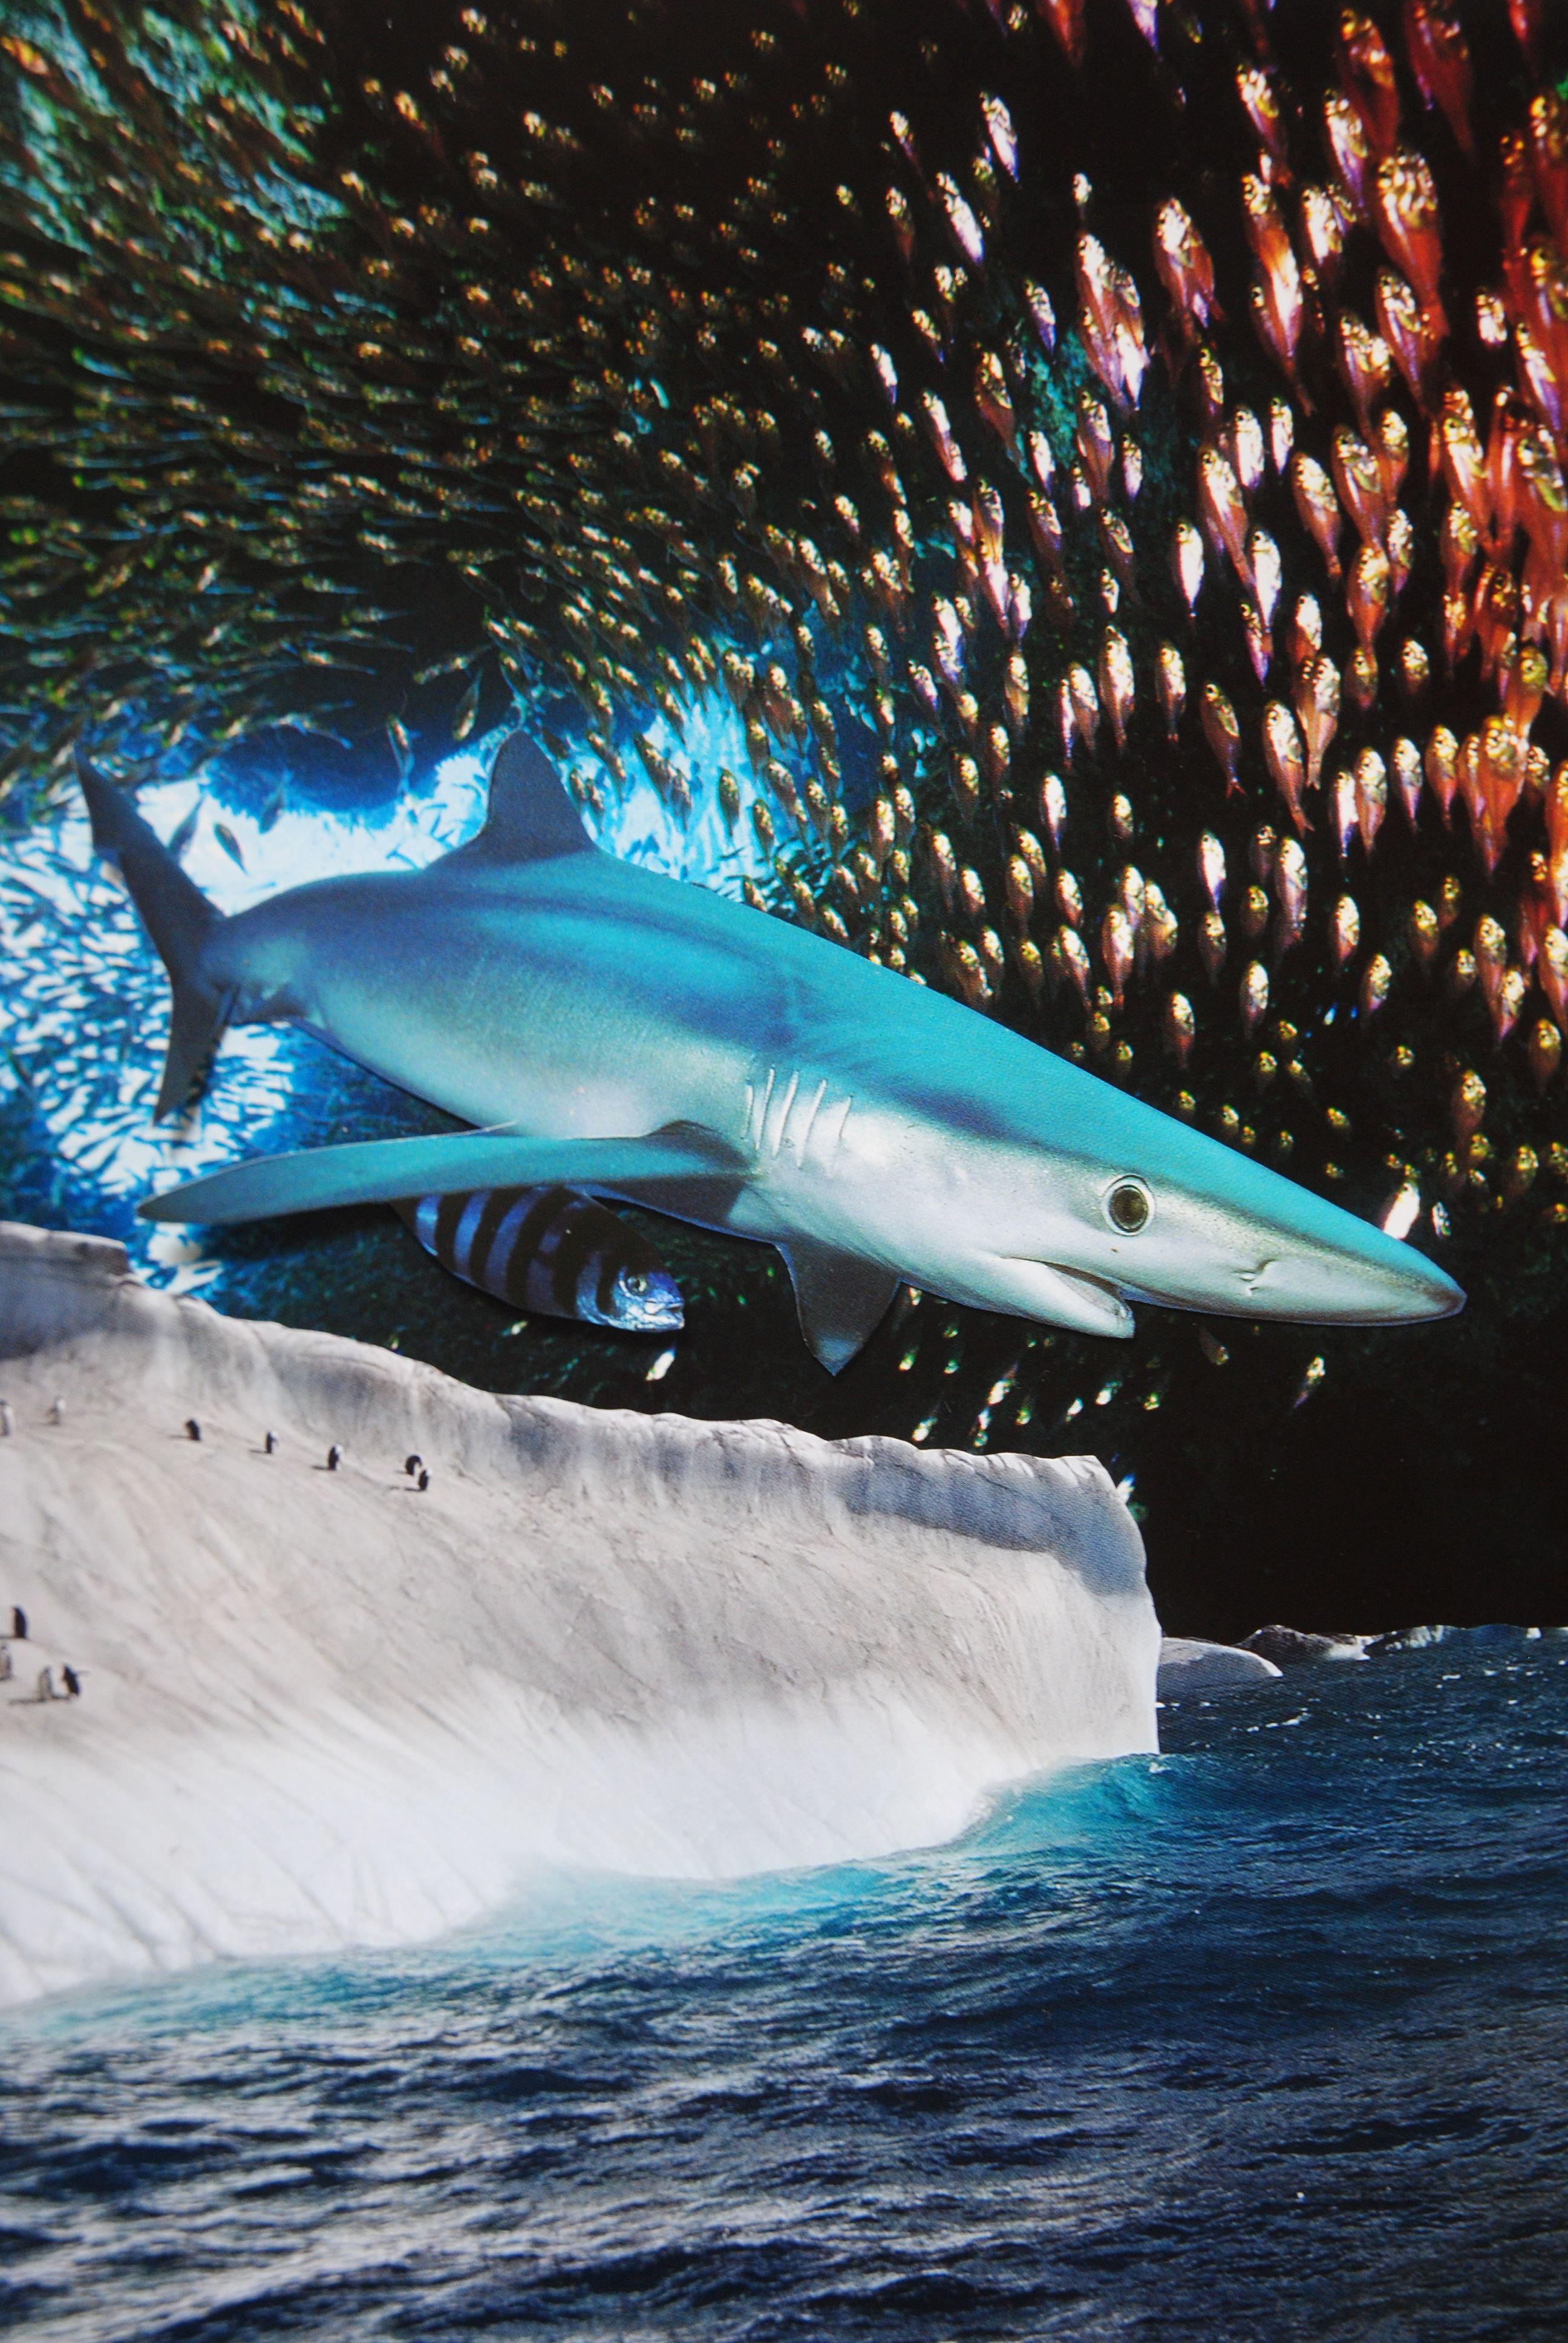 Blue shark john turck collage original collage photo